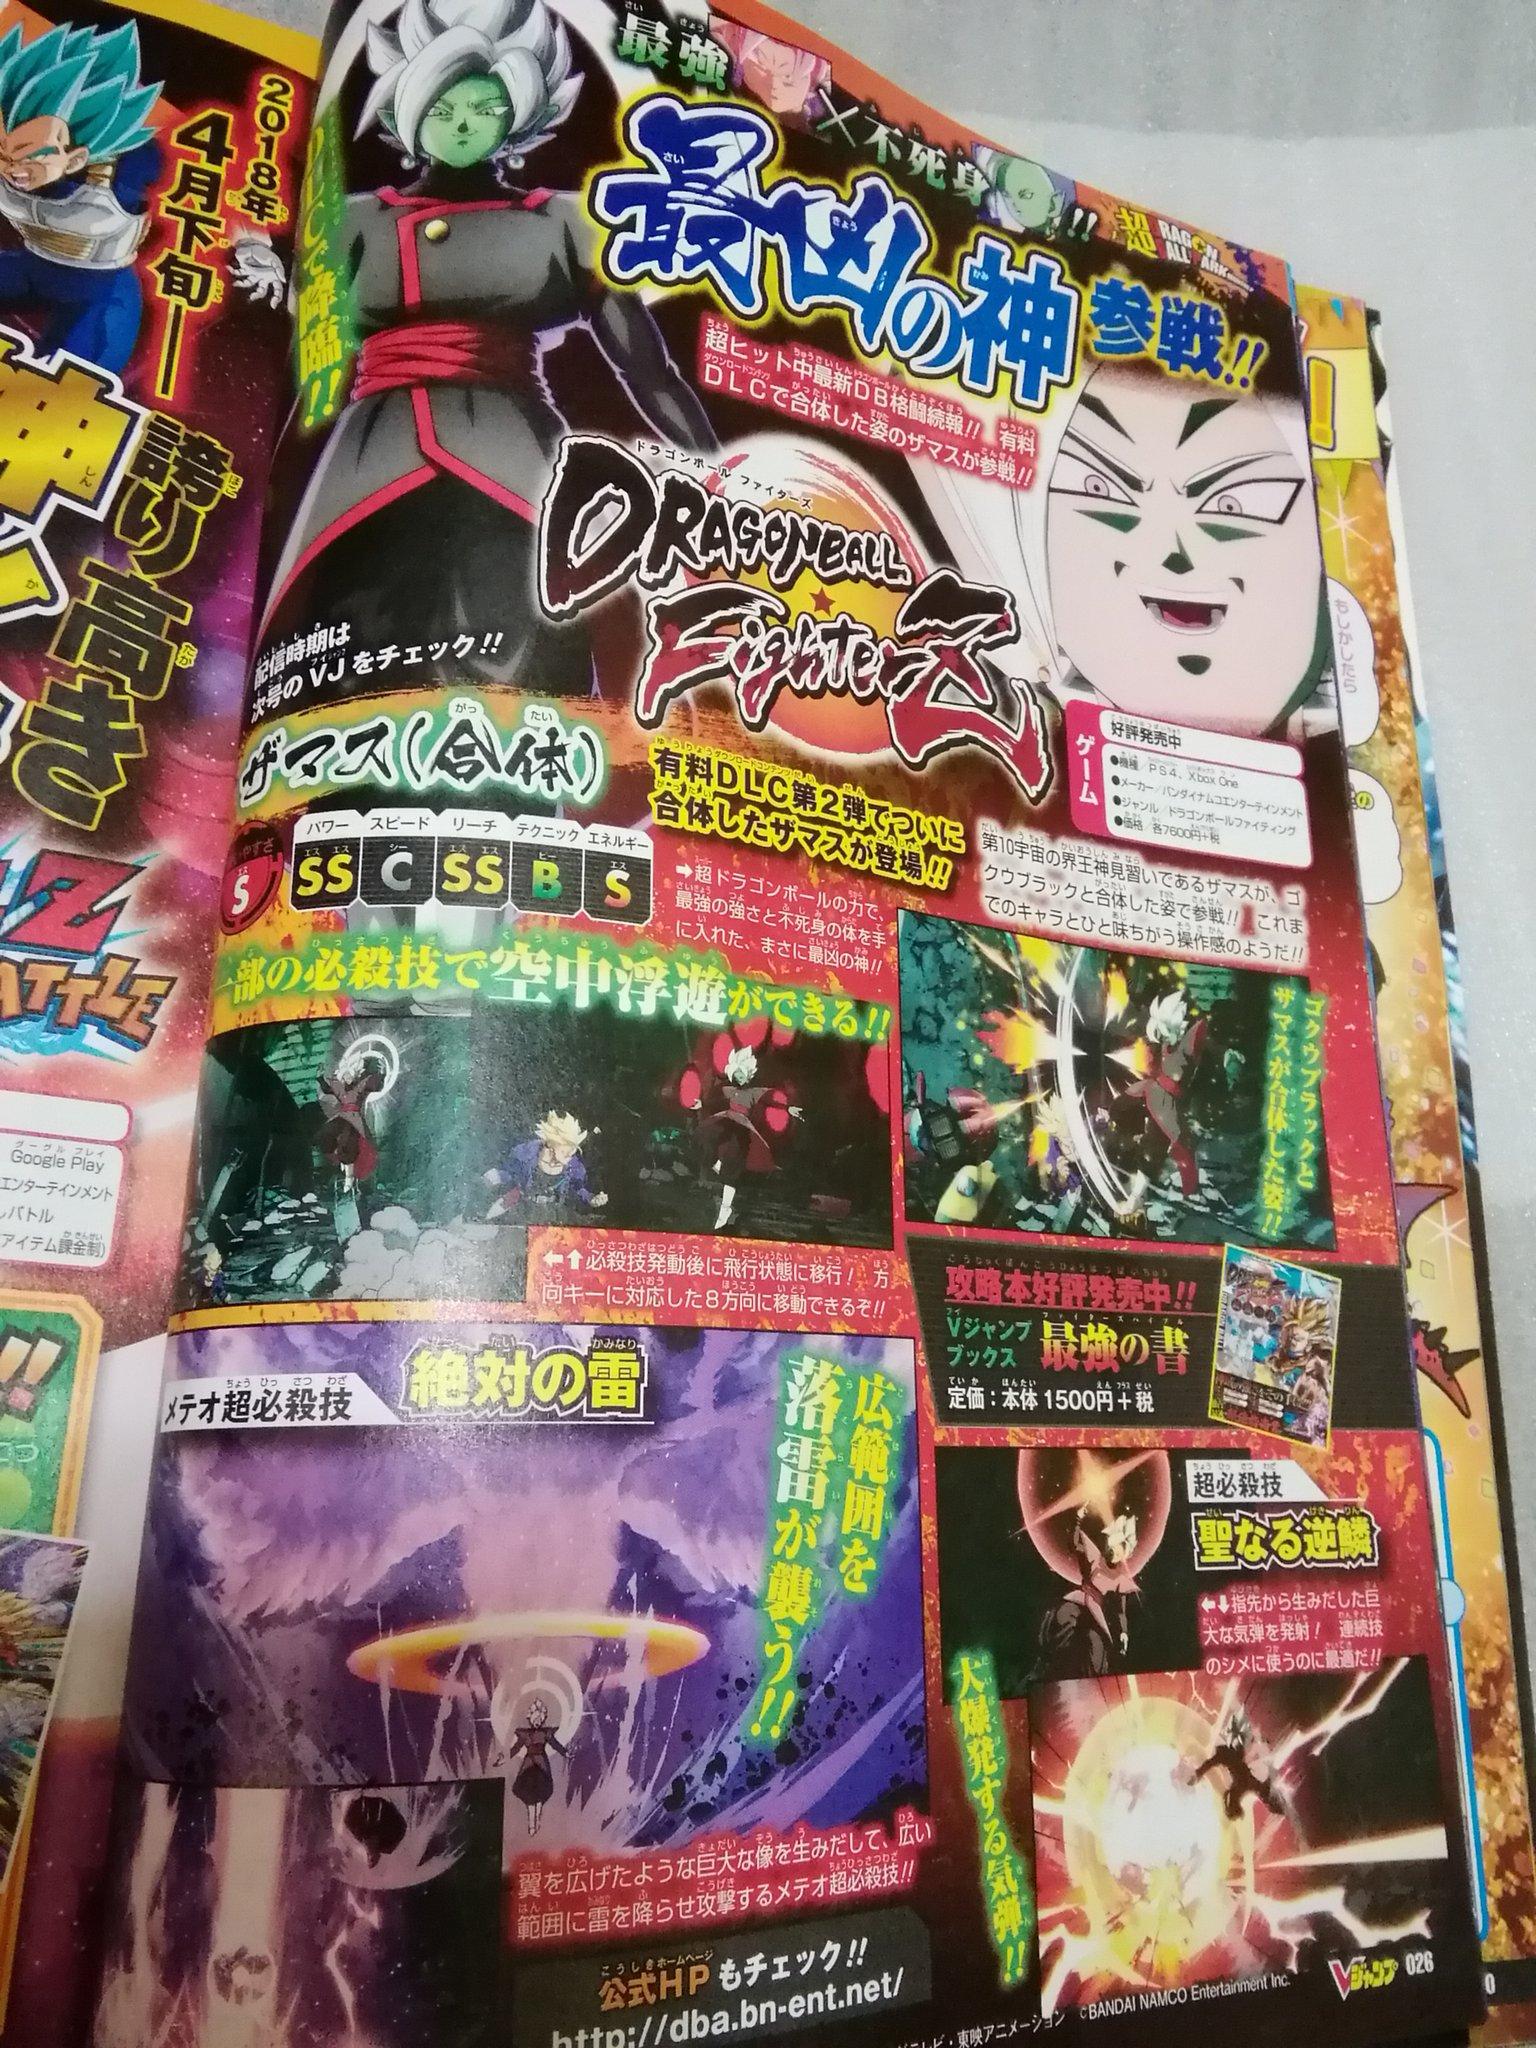 Próximo lutador de Dragon Ball FighterZ será o Zamasu fundido; detalhes 1